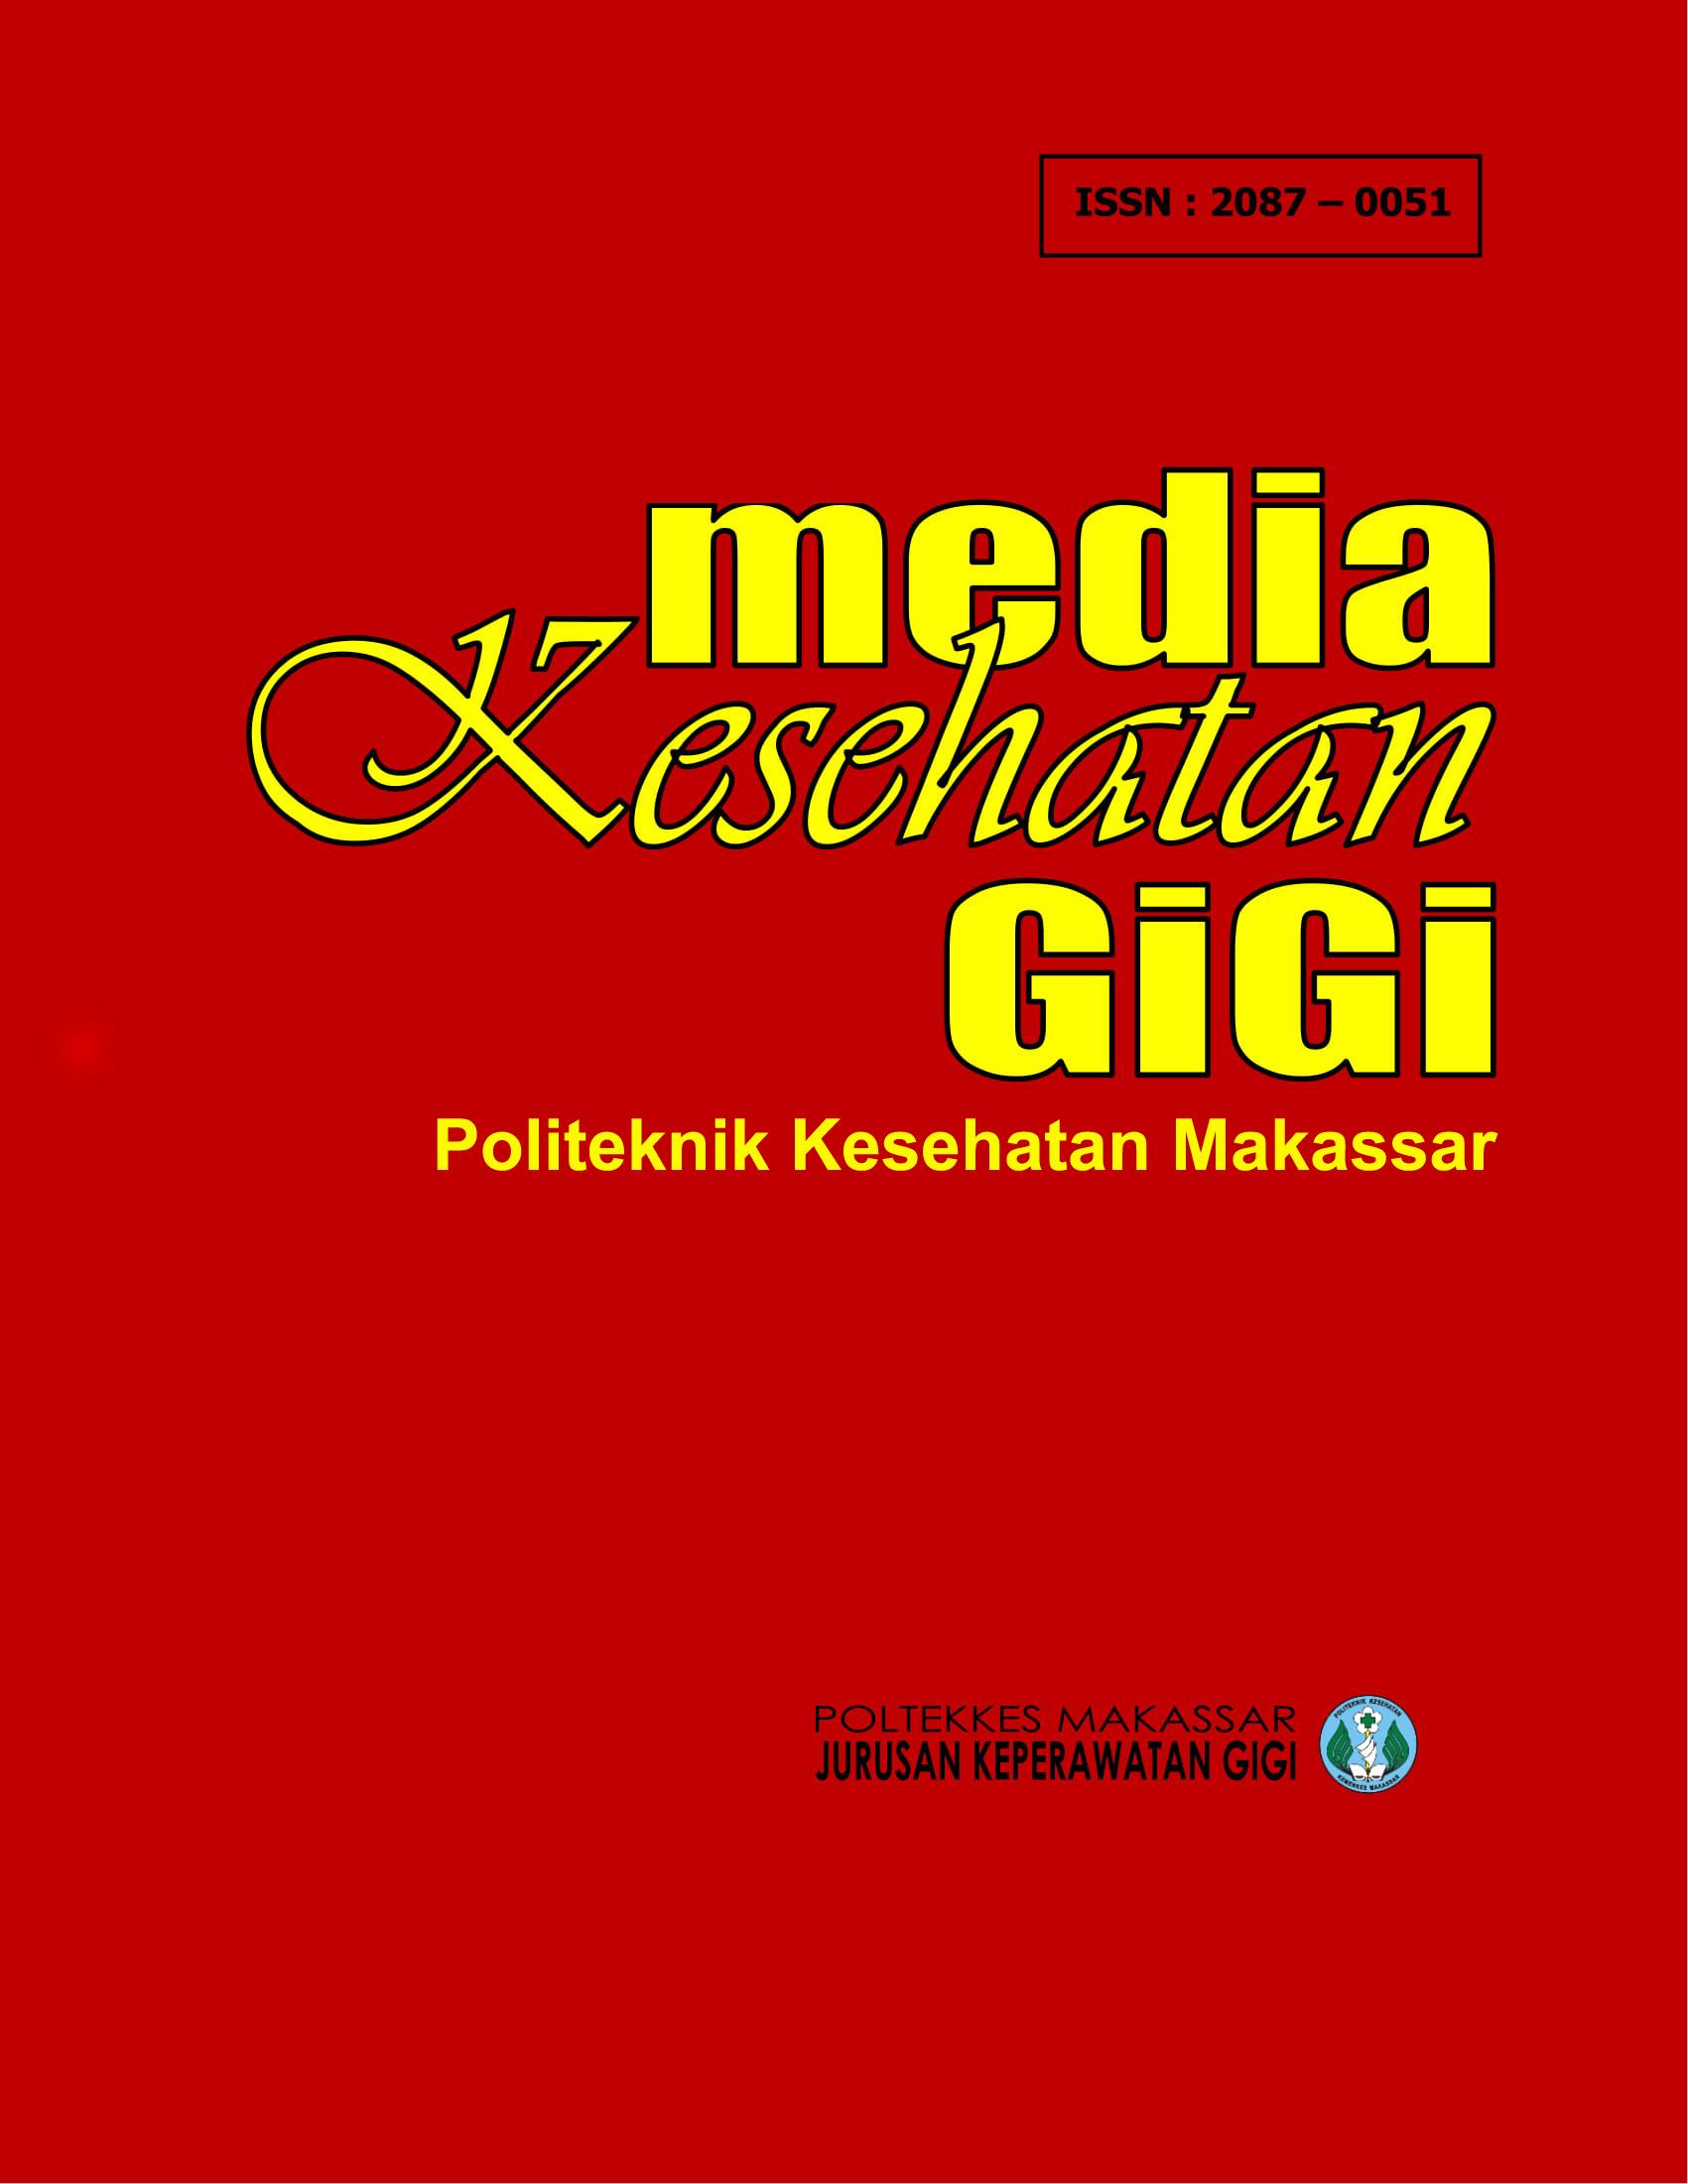 Media Kesehatan Gigi Politeknik Kesehatan Makassar